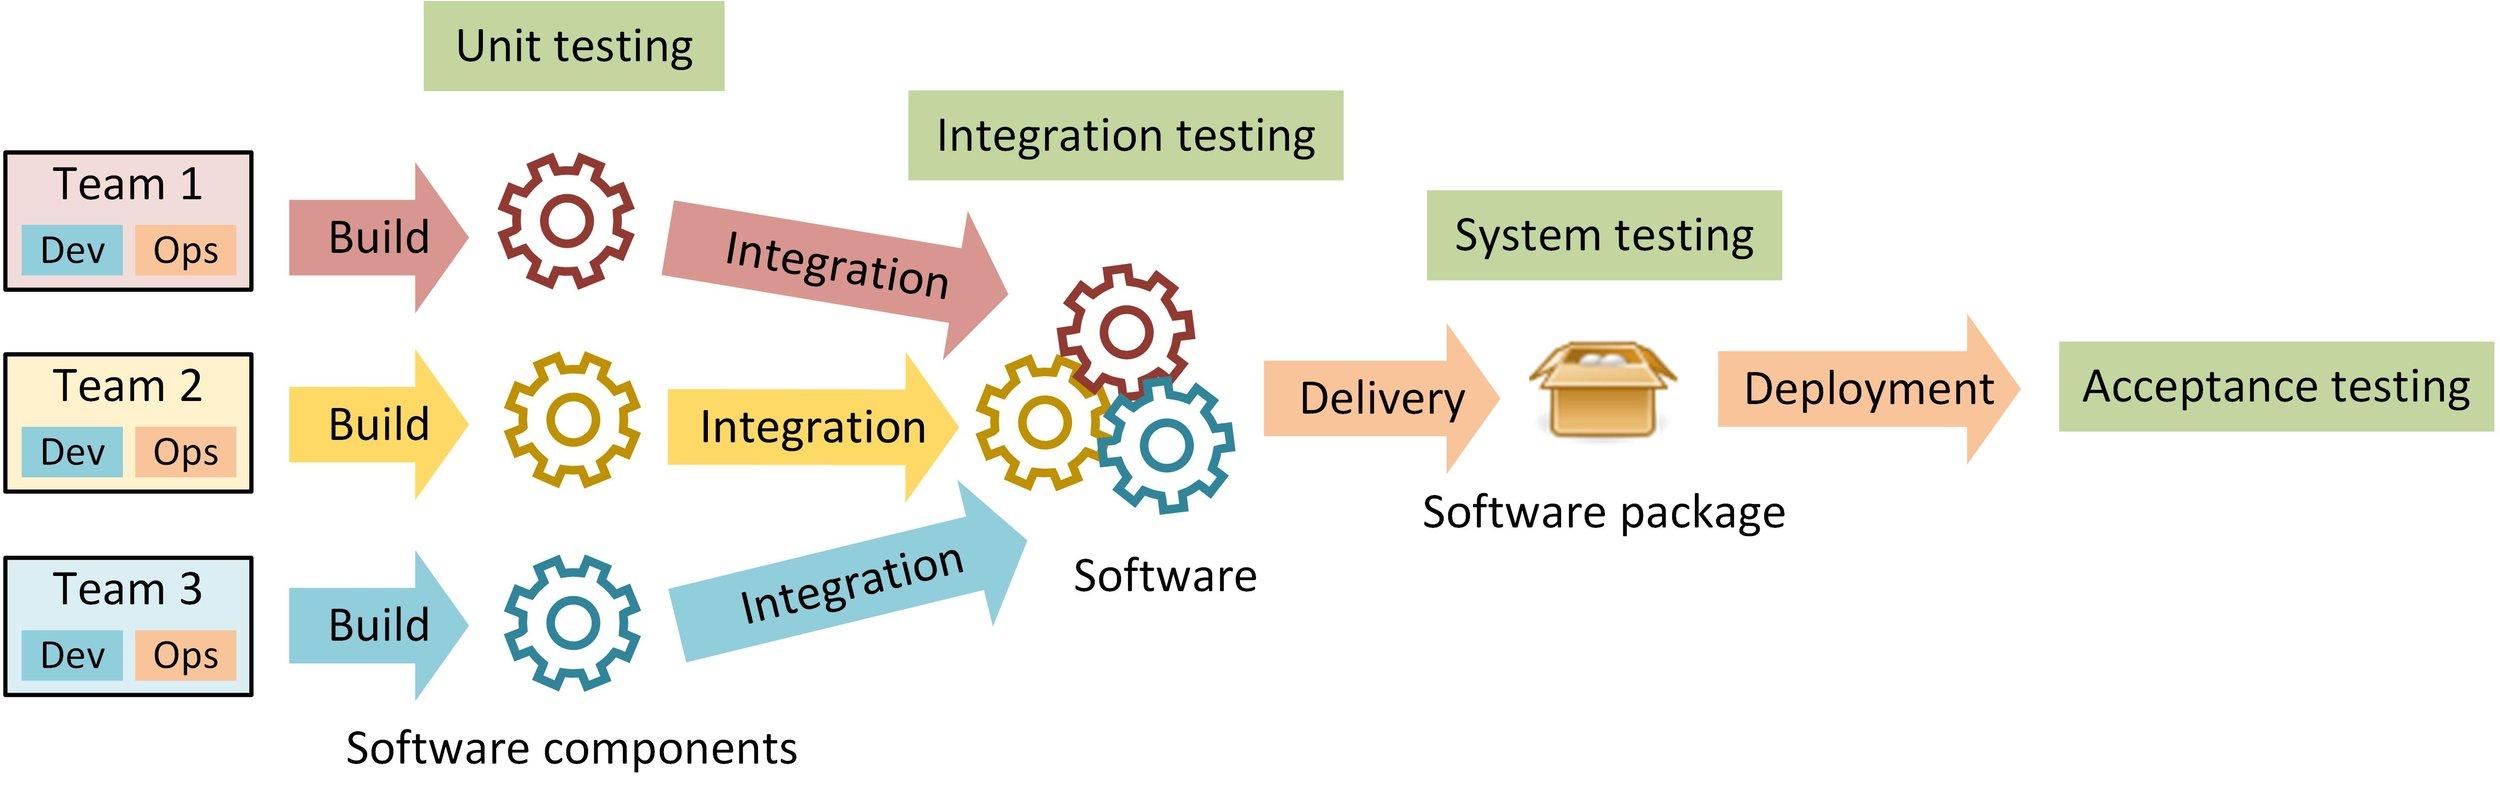 Unit testing versus integration testing.jpg